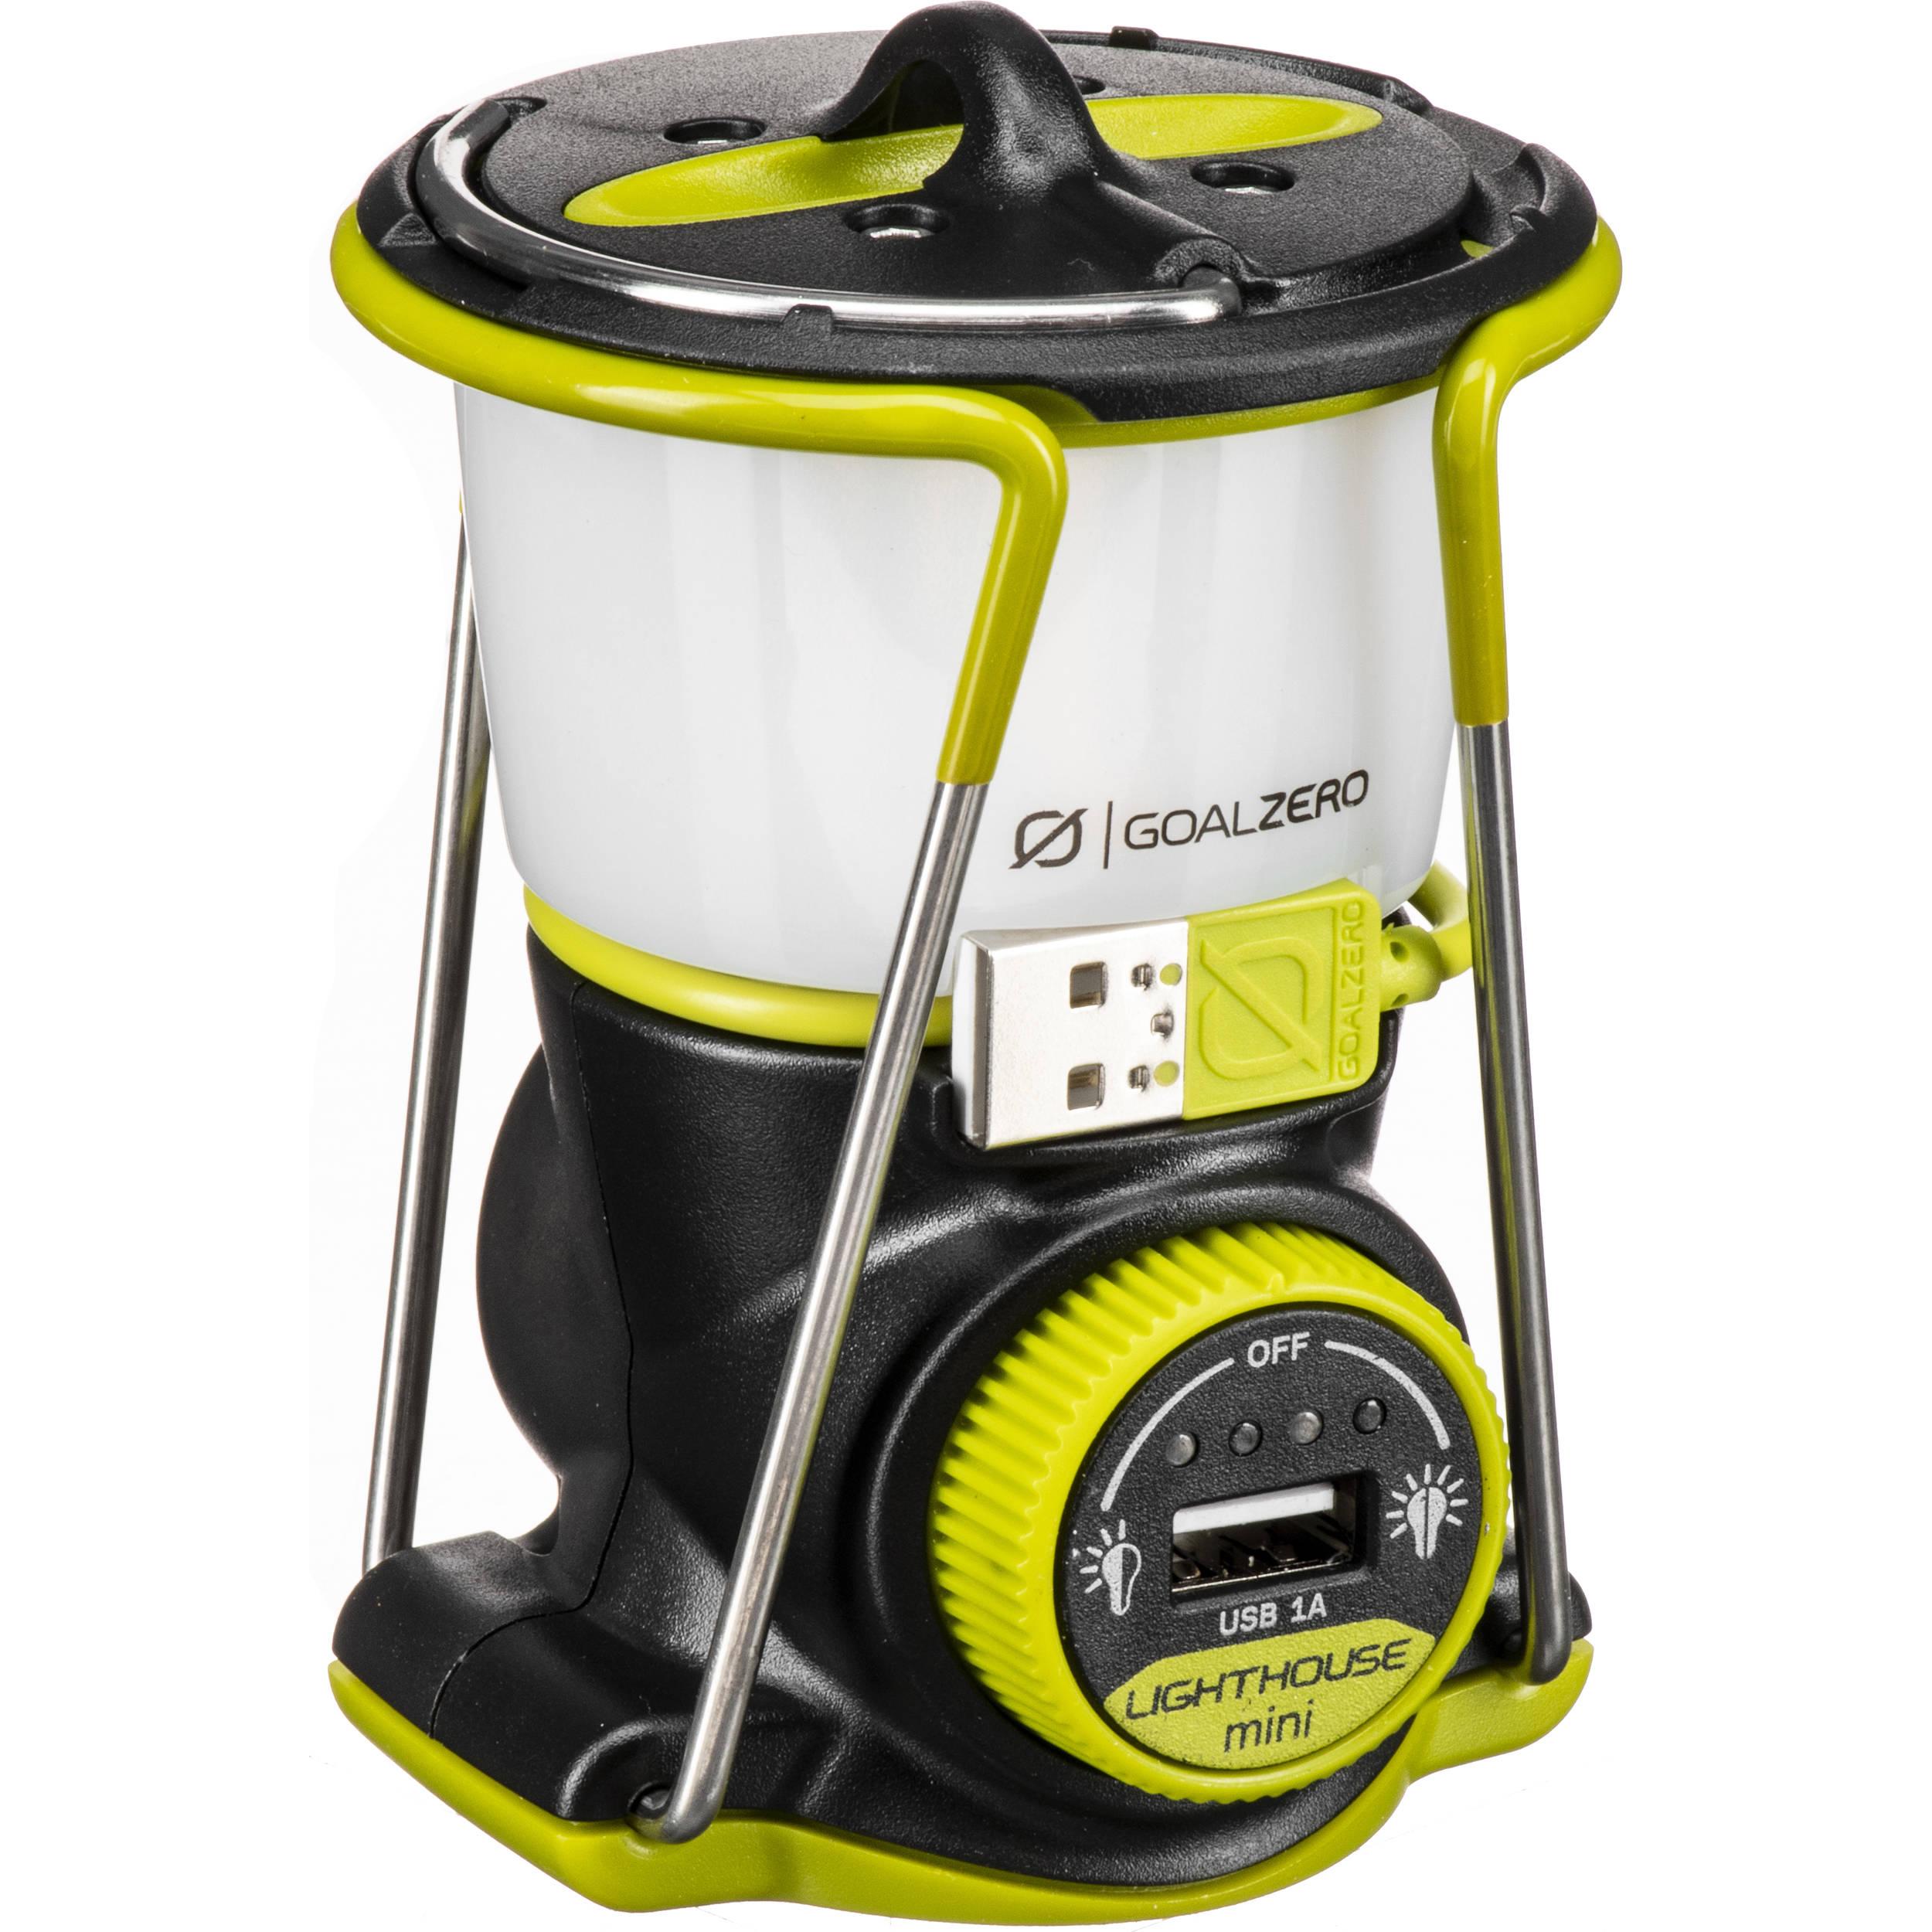 GOAL ZERO Lighthouse Mini Lantern and USB Power Hub 32011 B&H